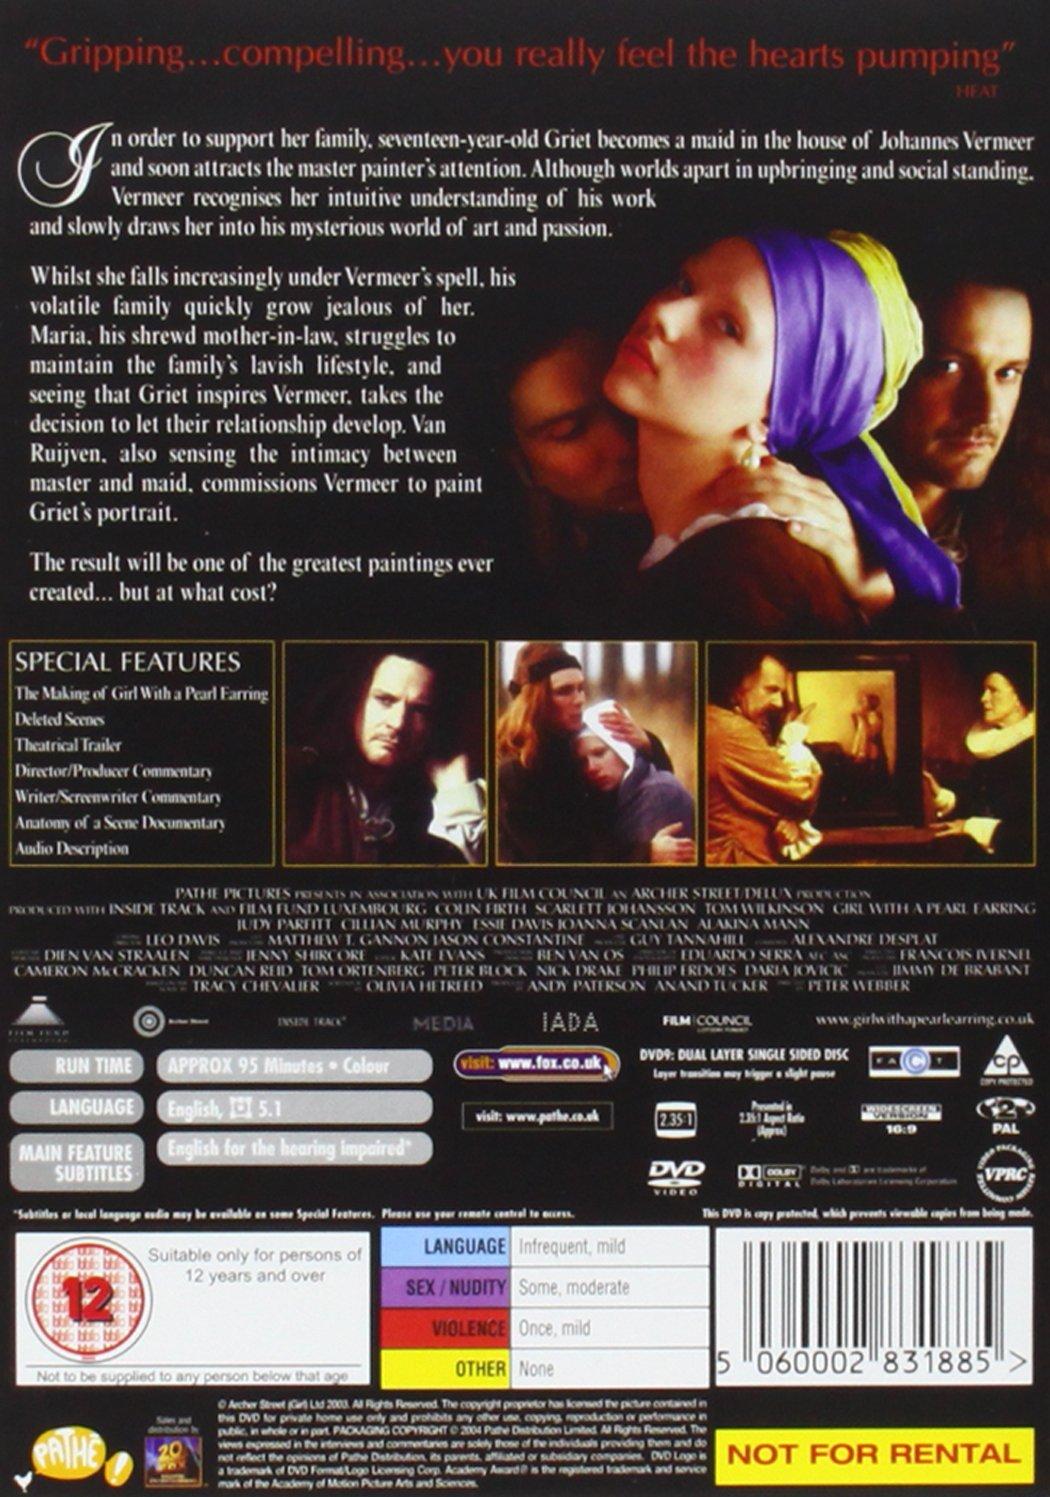 Amazon.com: Girl with a Pearl Earring: Scarlett Johansson, Colin Firth, Tom Wilkinson, Judy Parfitt, Cillian Murphy, Essie Davis, Joanna Scanlan, ...